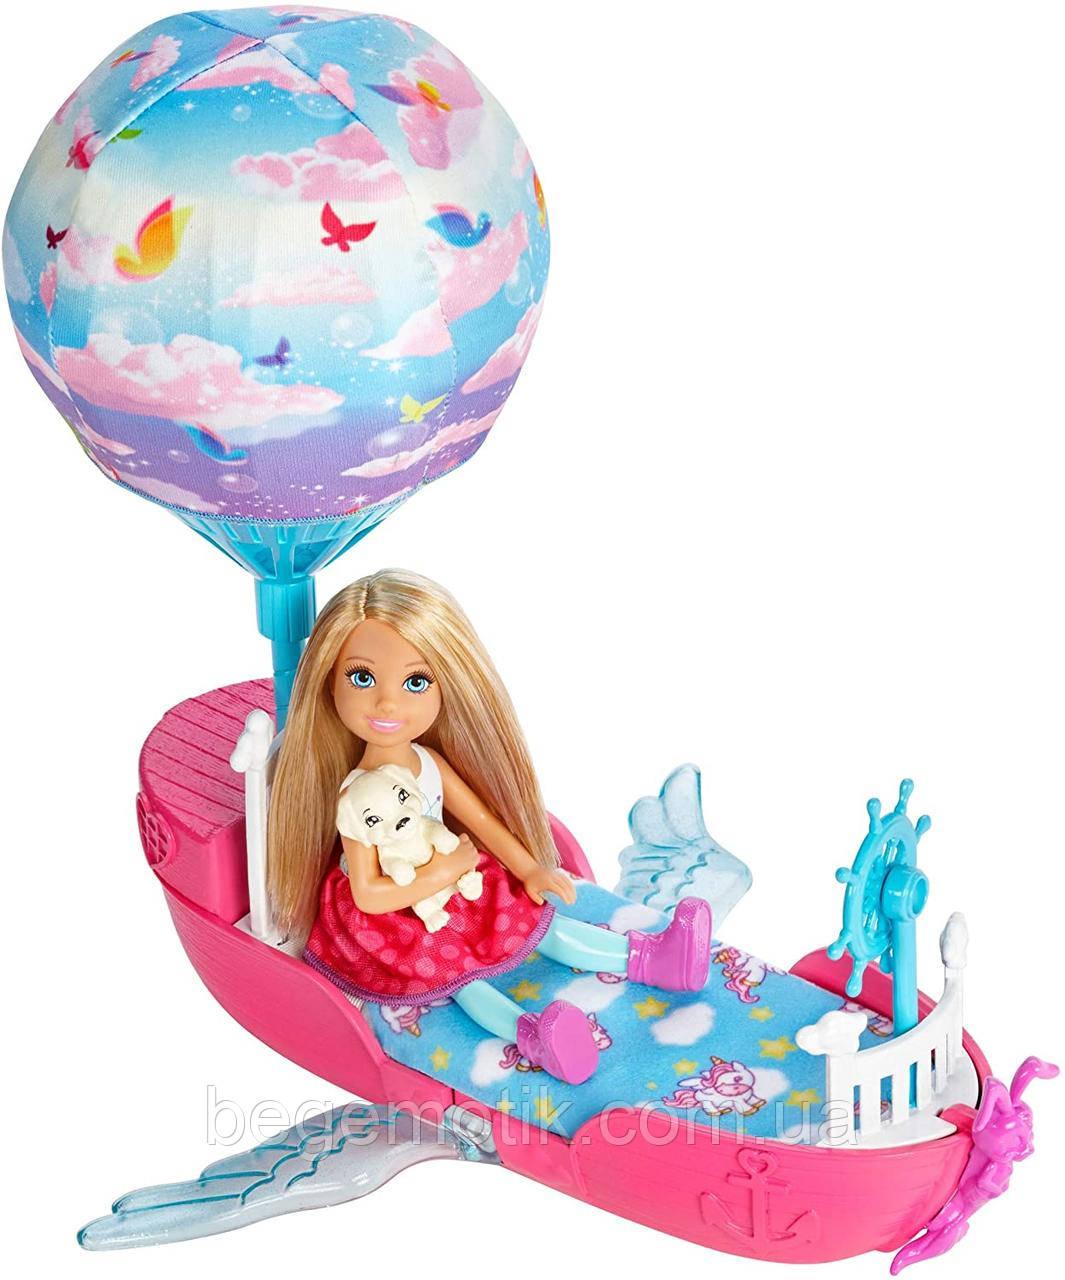 Barbie Кукла Челси и ее магическая летающая лодочка серии Дримтопия Dreamtopia Magical Dream boat and Chelsea